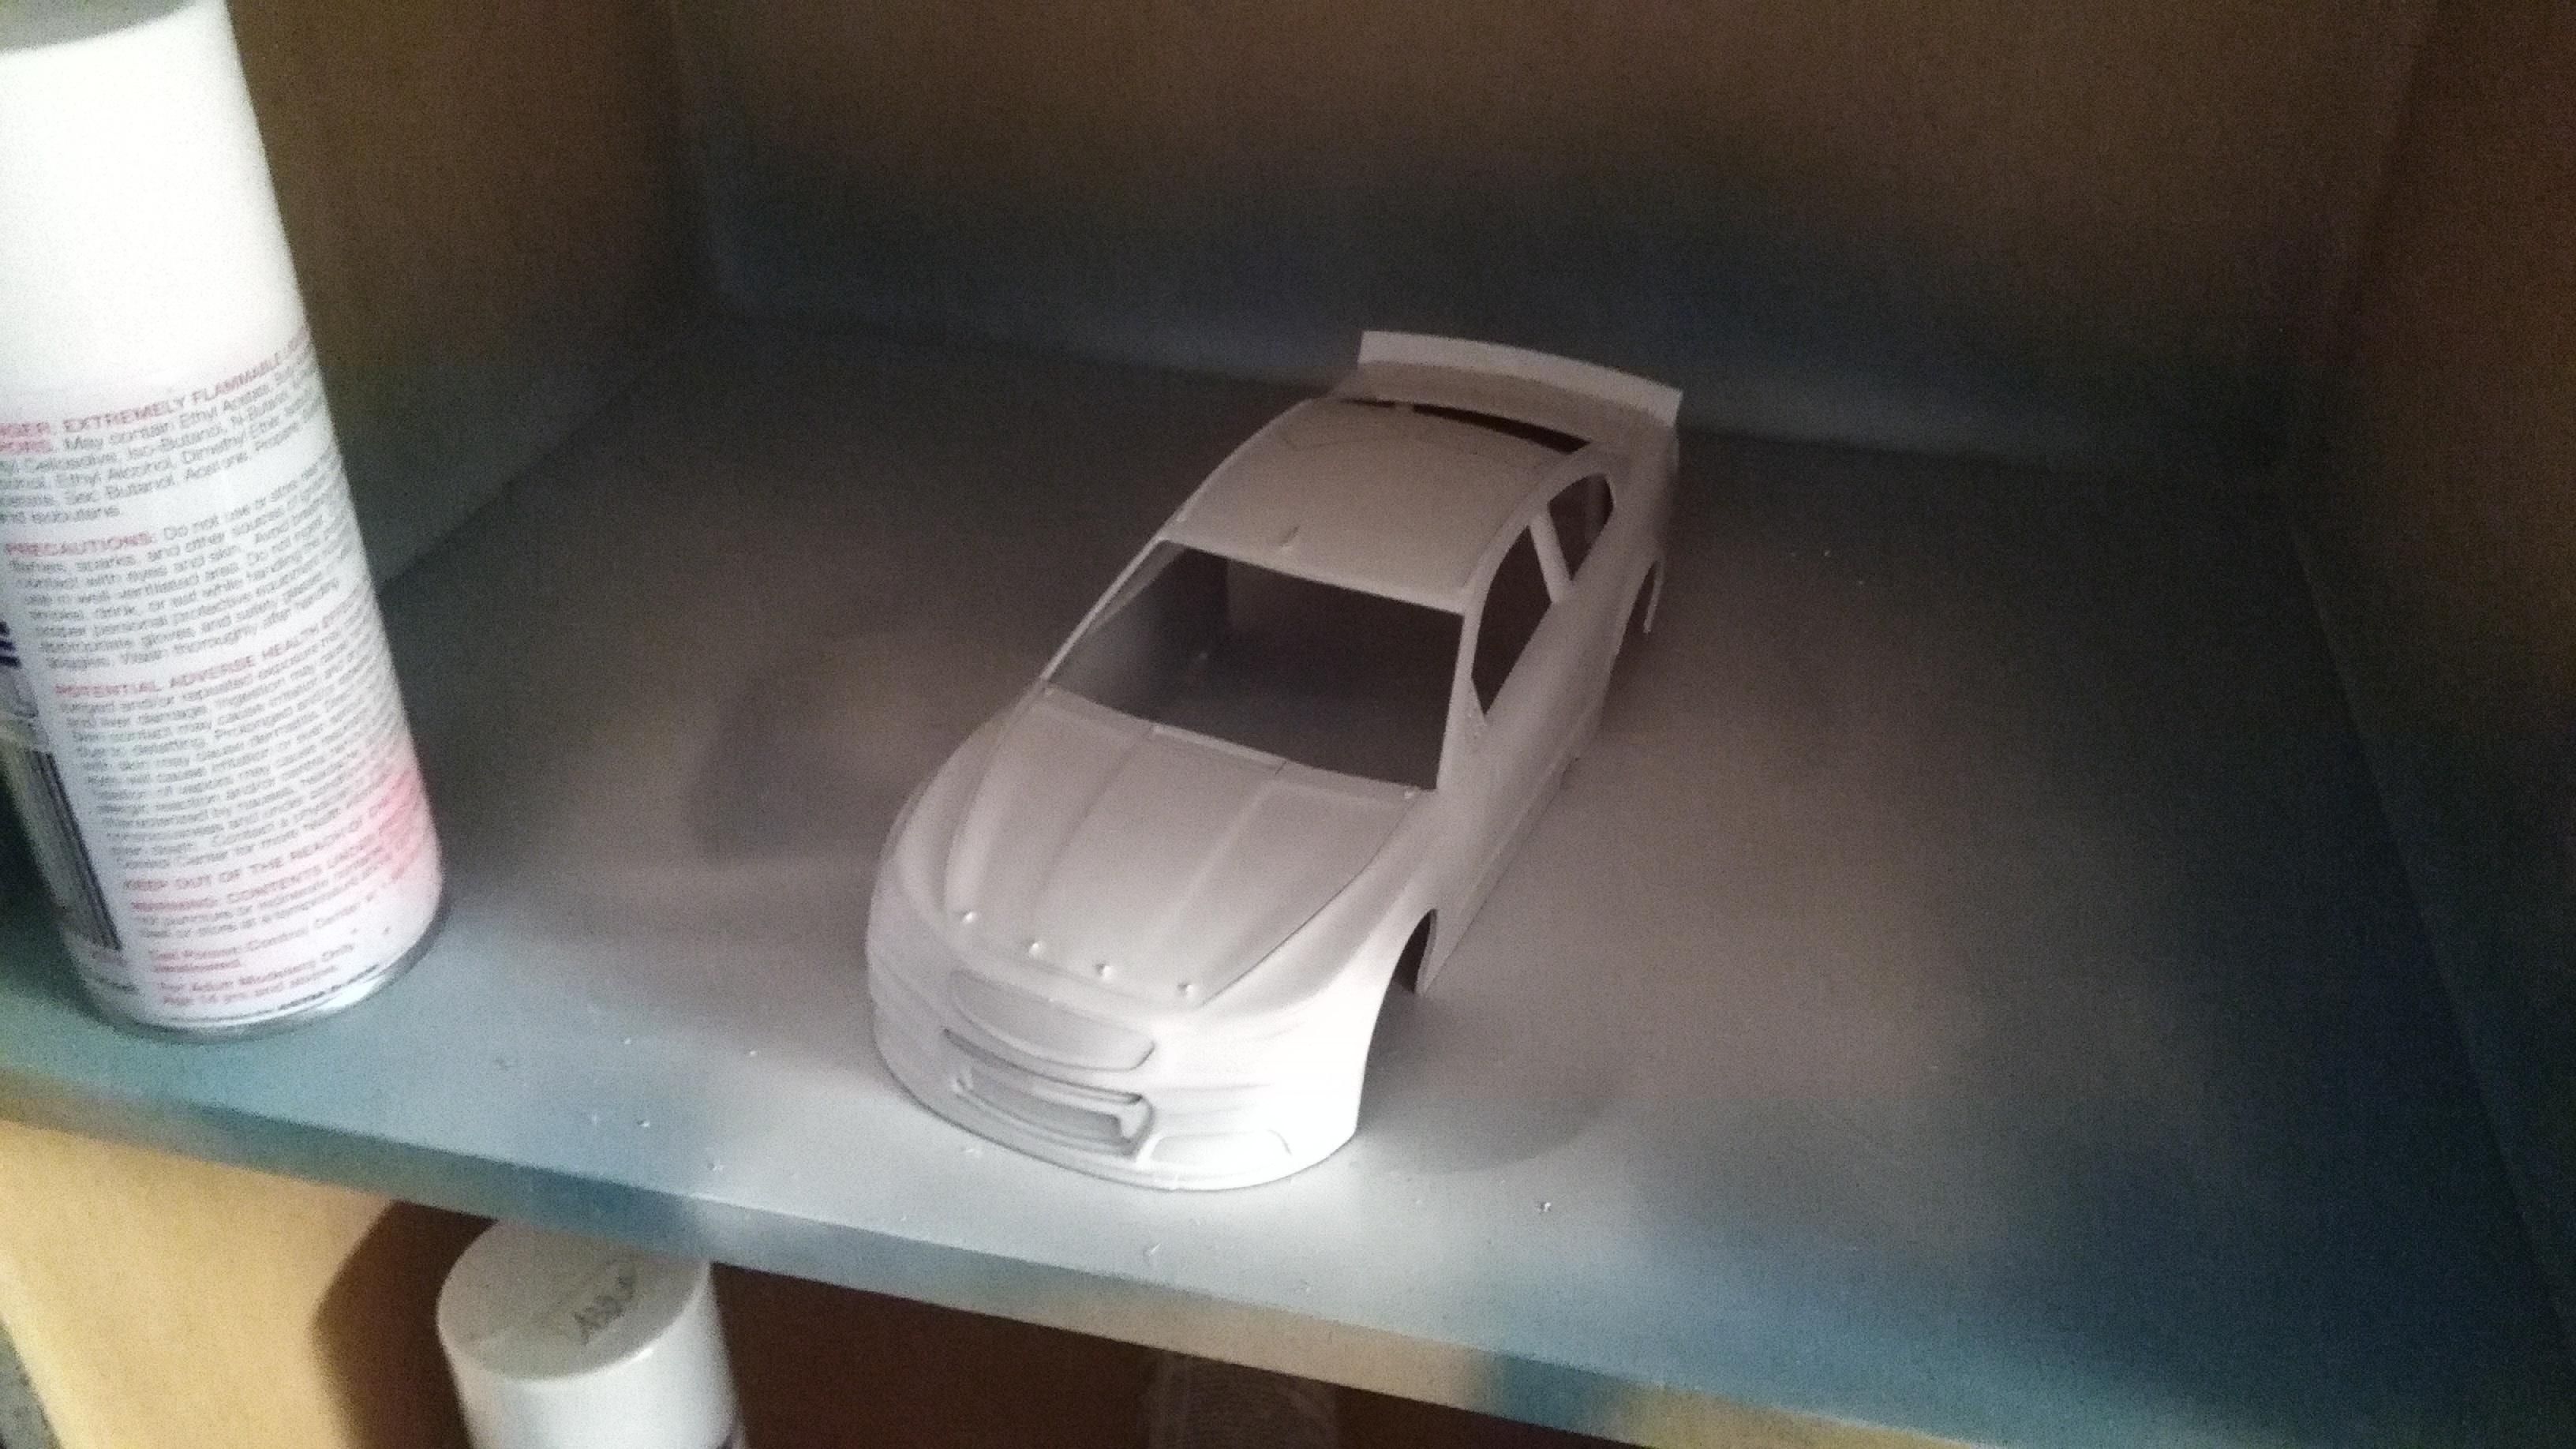 Chevrolet SS 2015 #24 Jeff Gordon 3M 628430IMG20170315140942